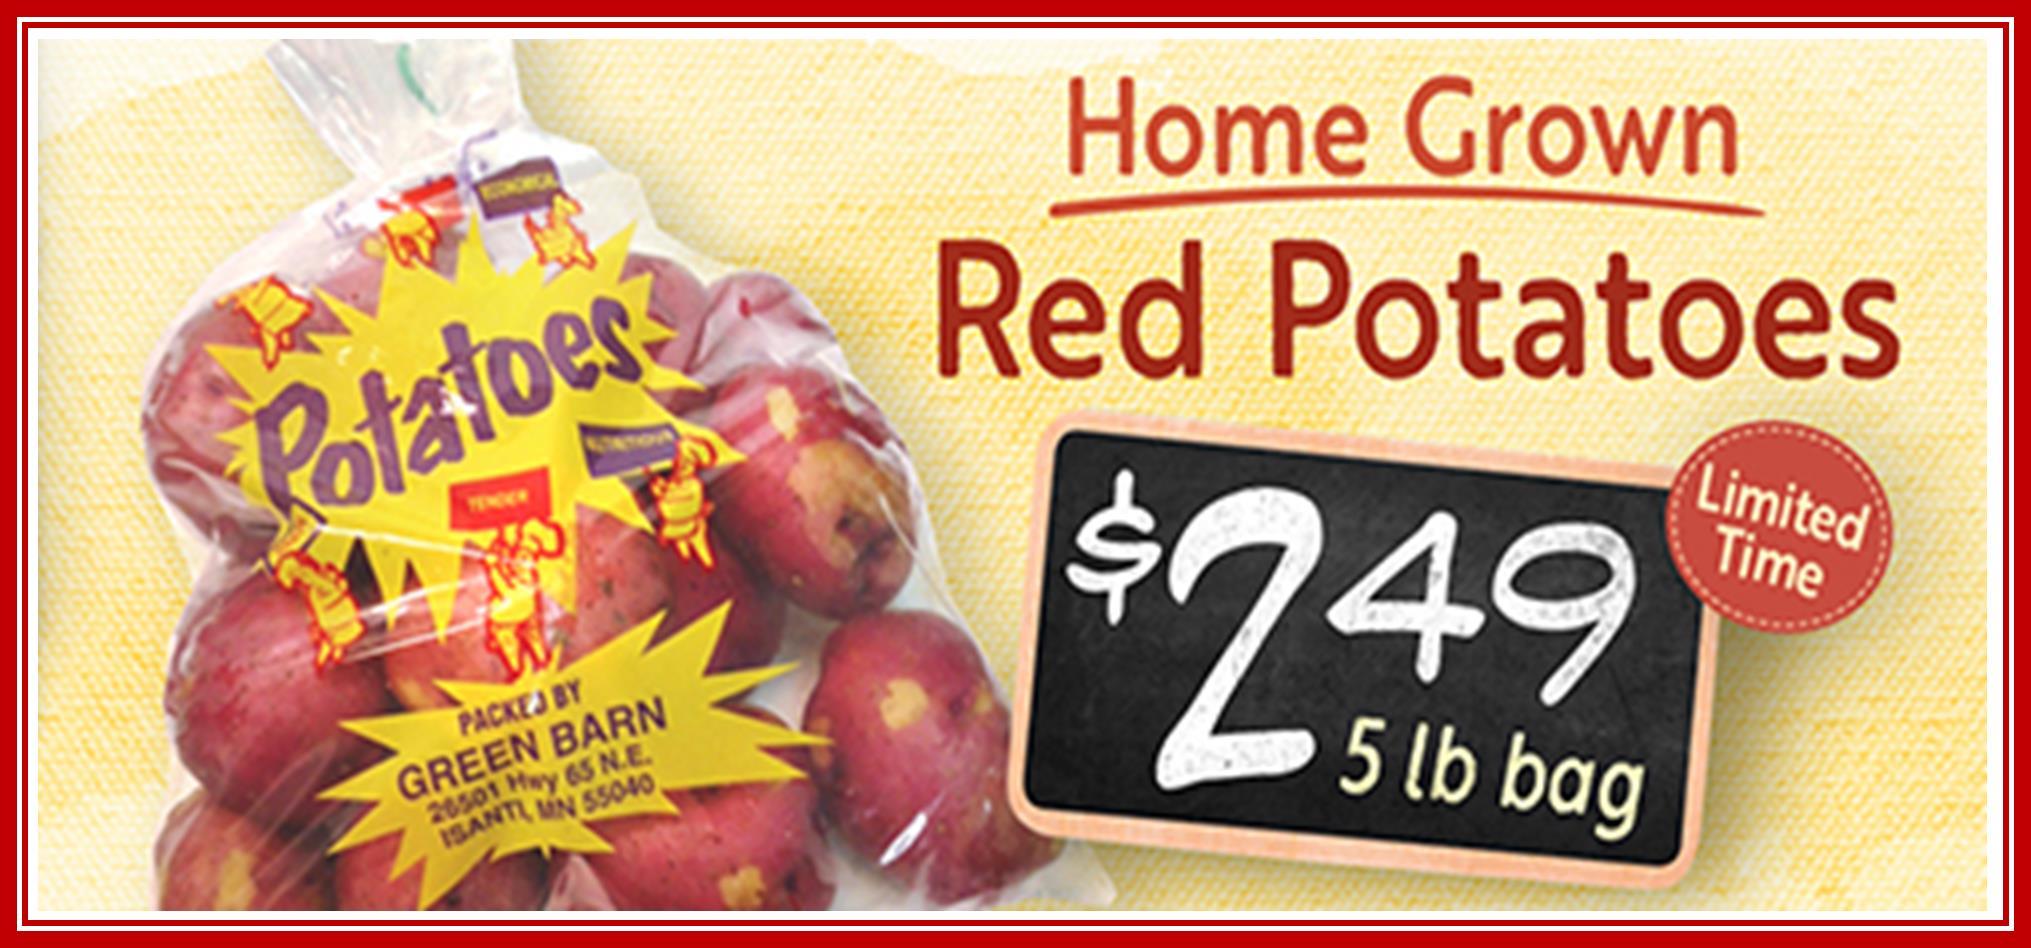 Potatoes Red HG 249.jpg